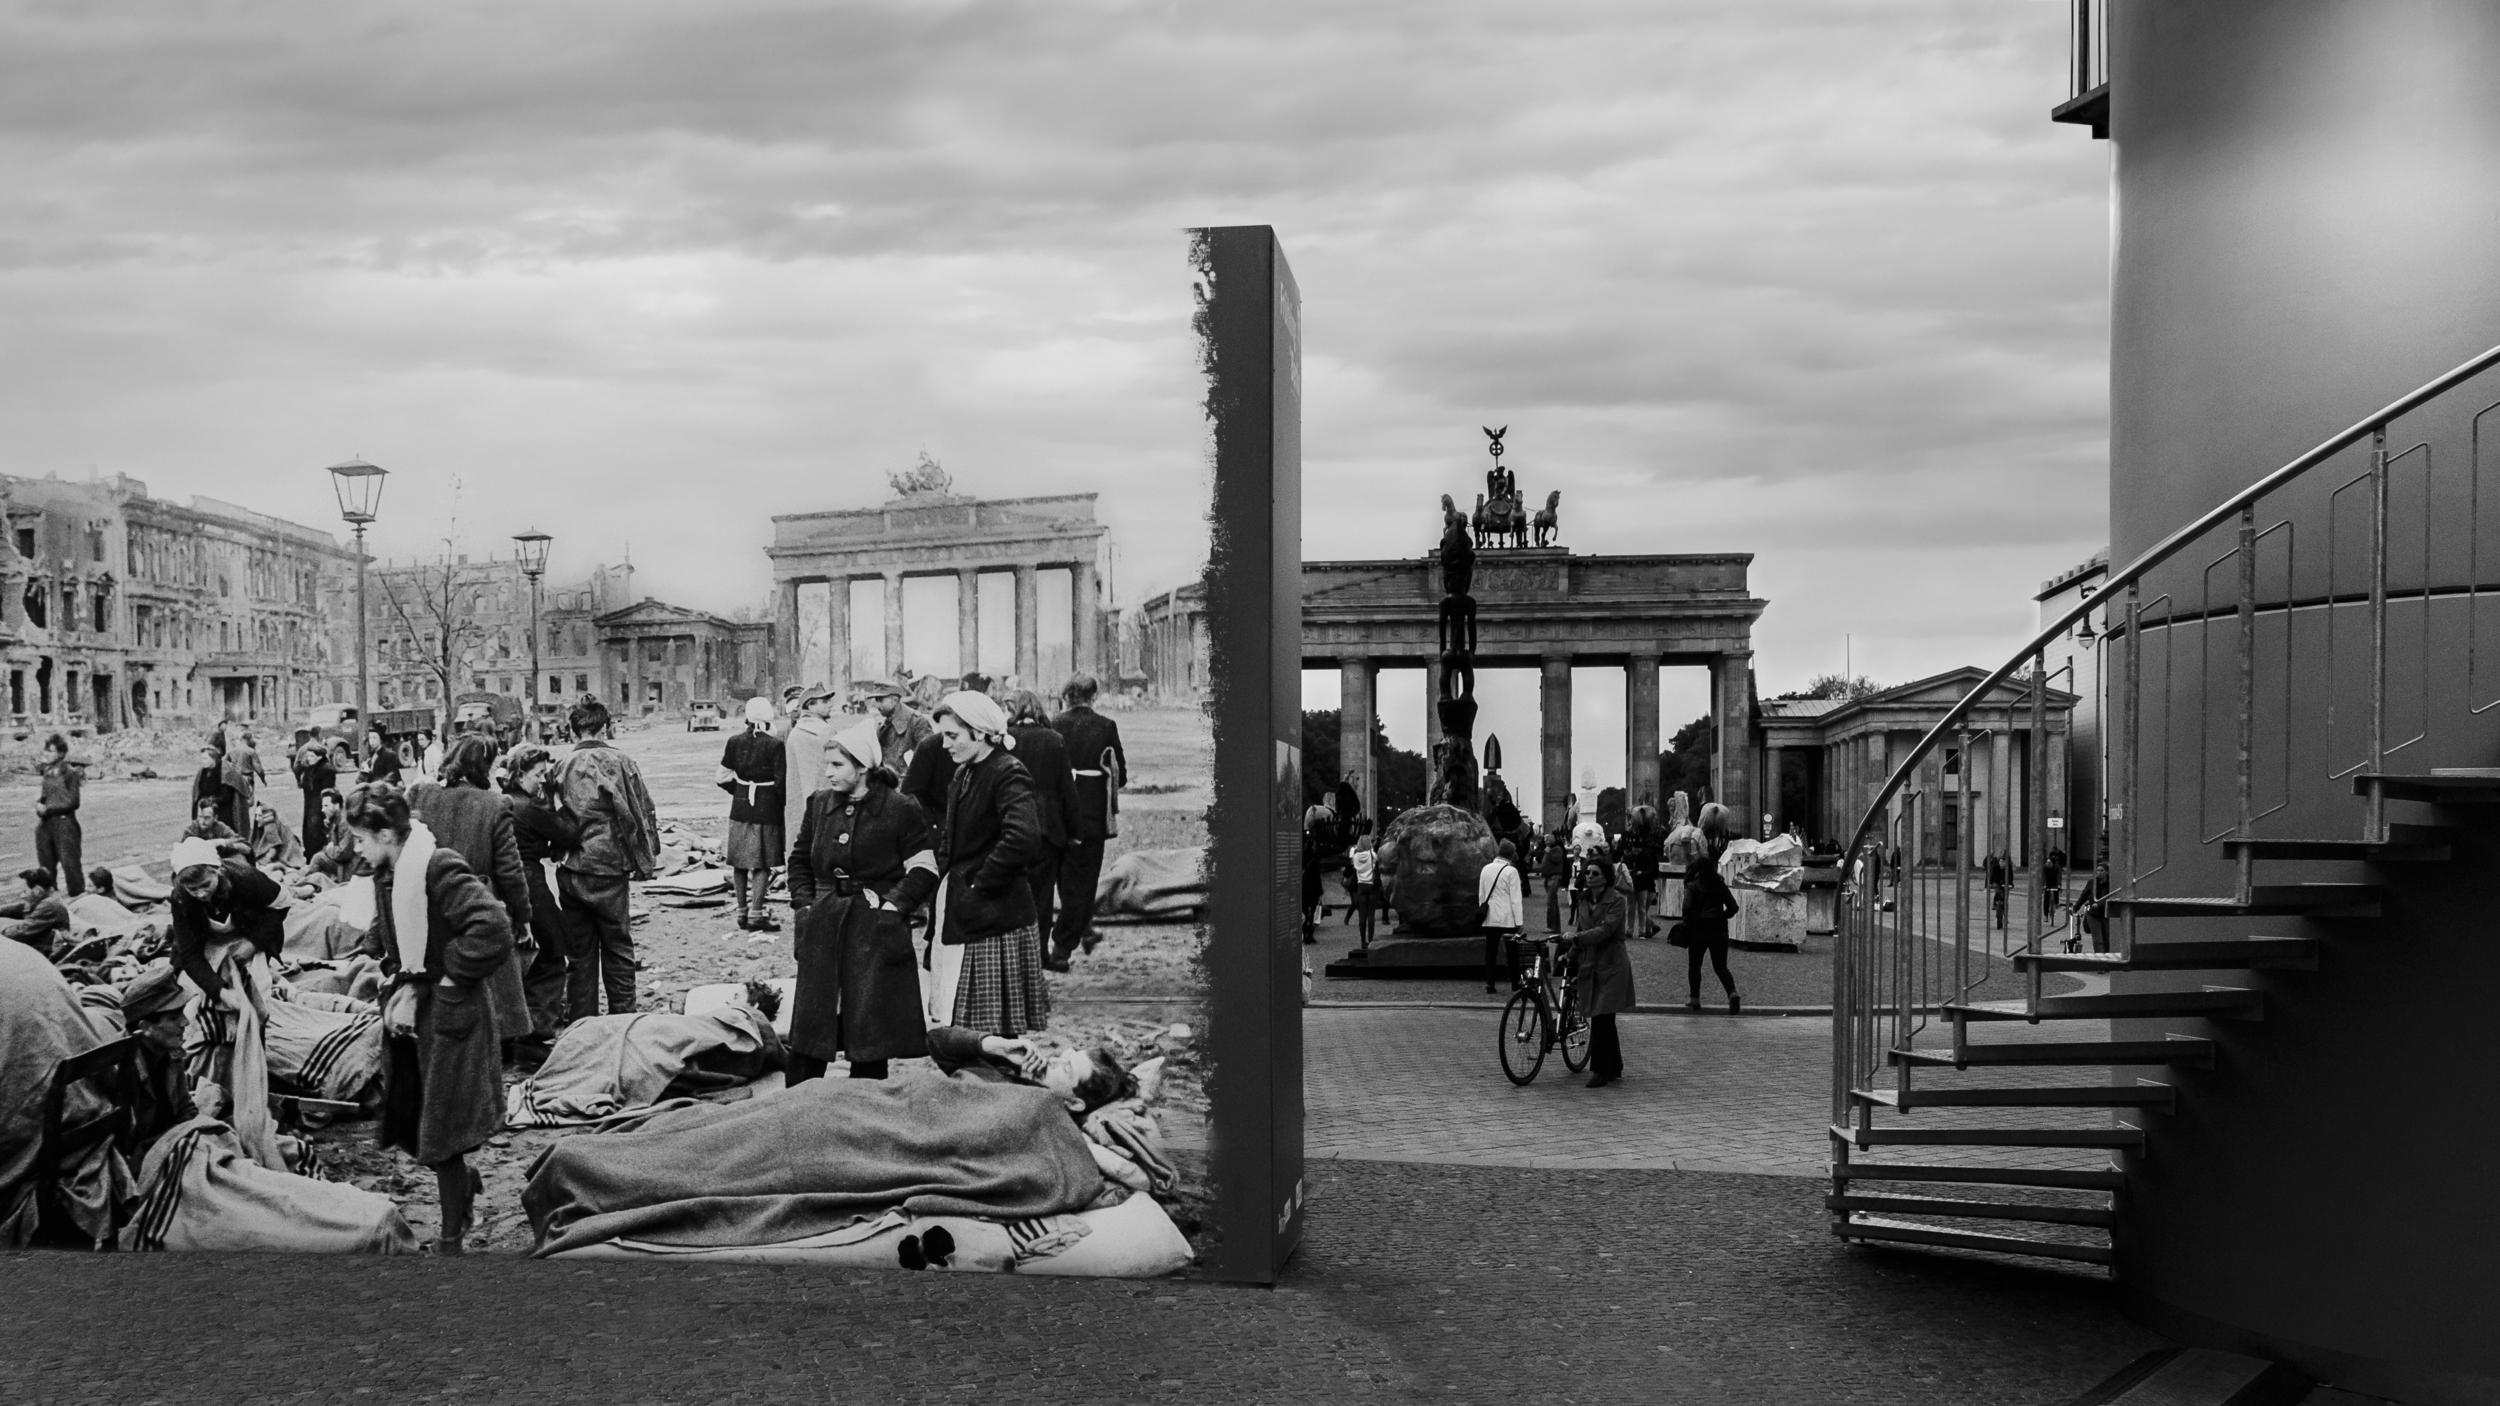 Brandenburger Tor 1945 and 2015